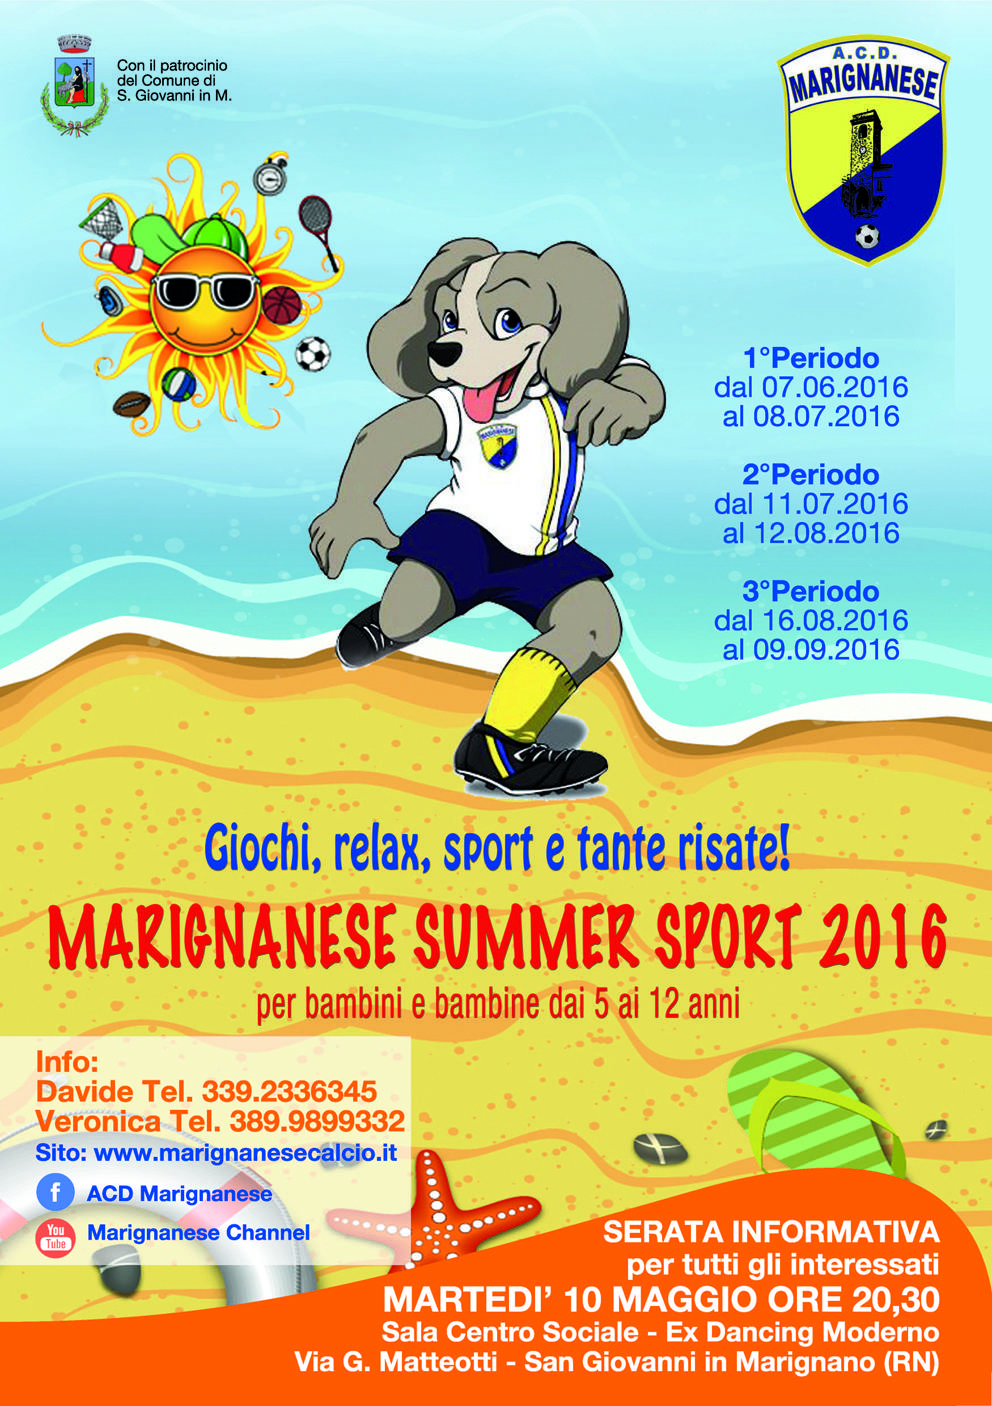 Marignanese Summer Sport 2016